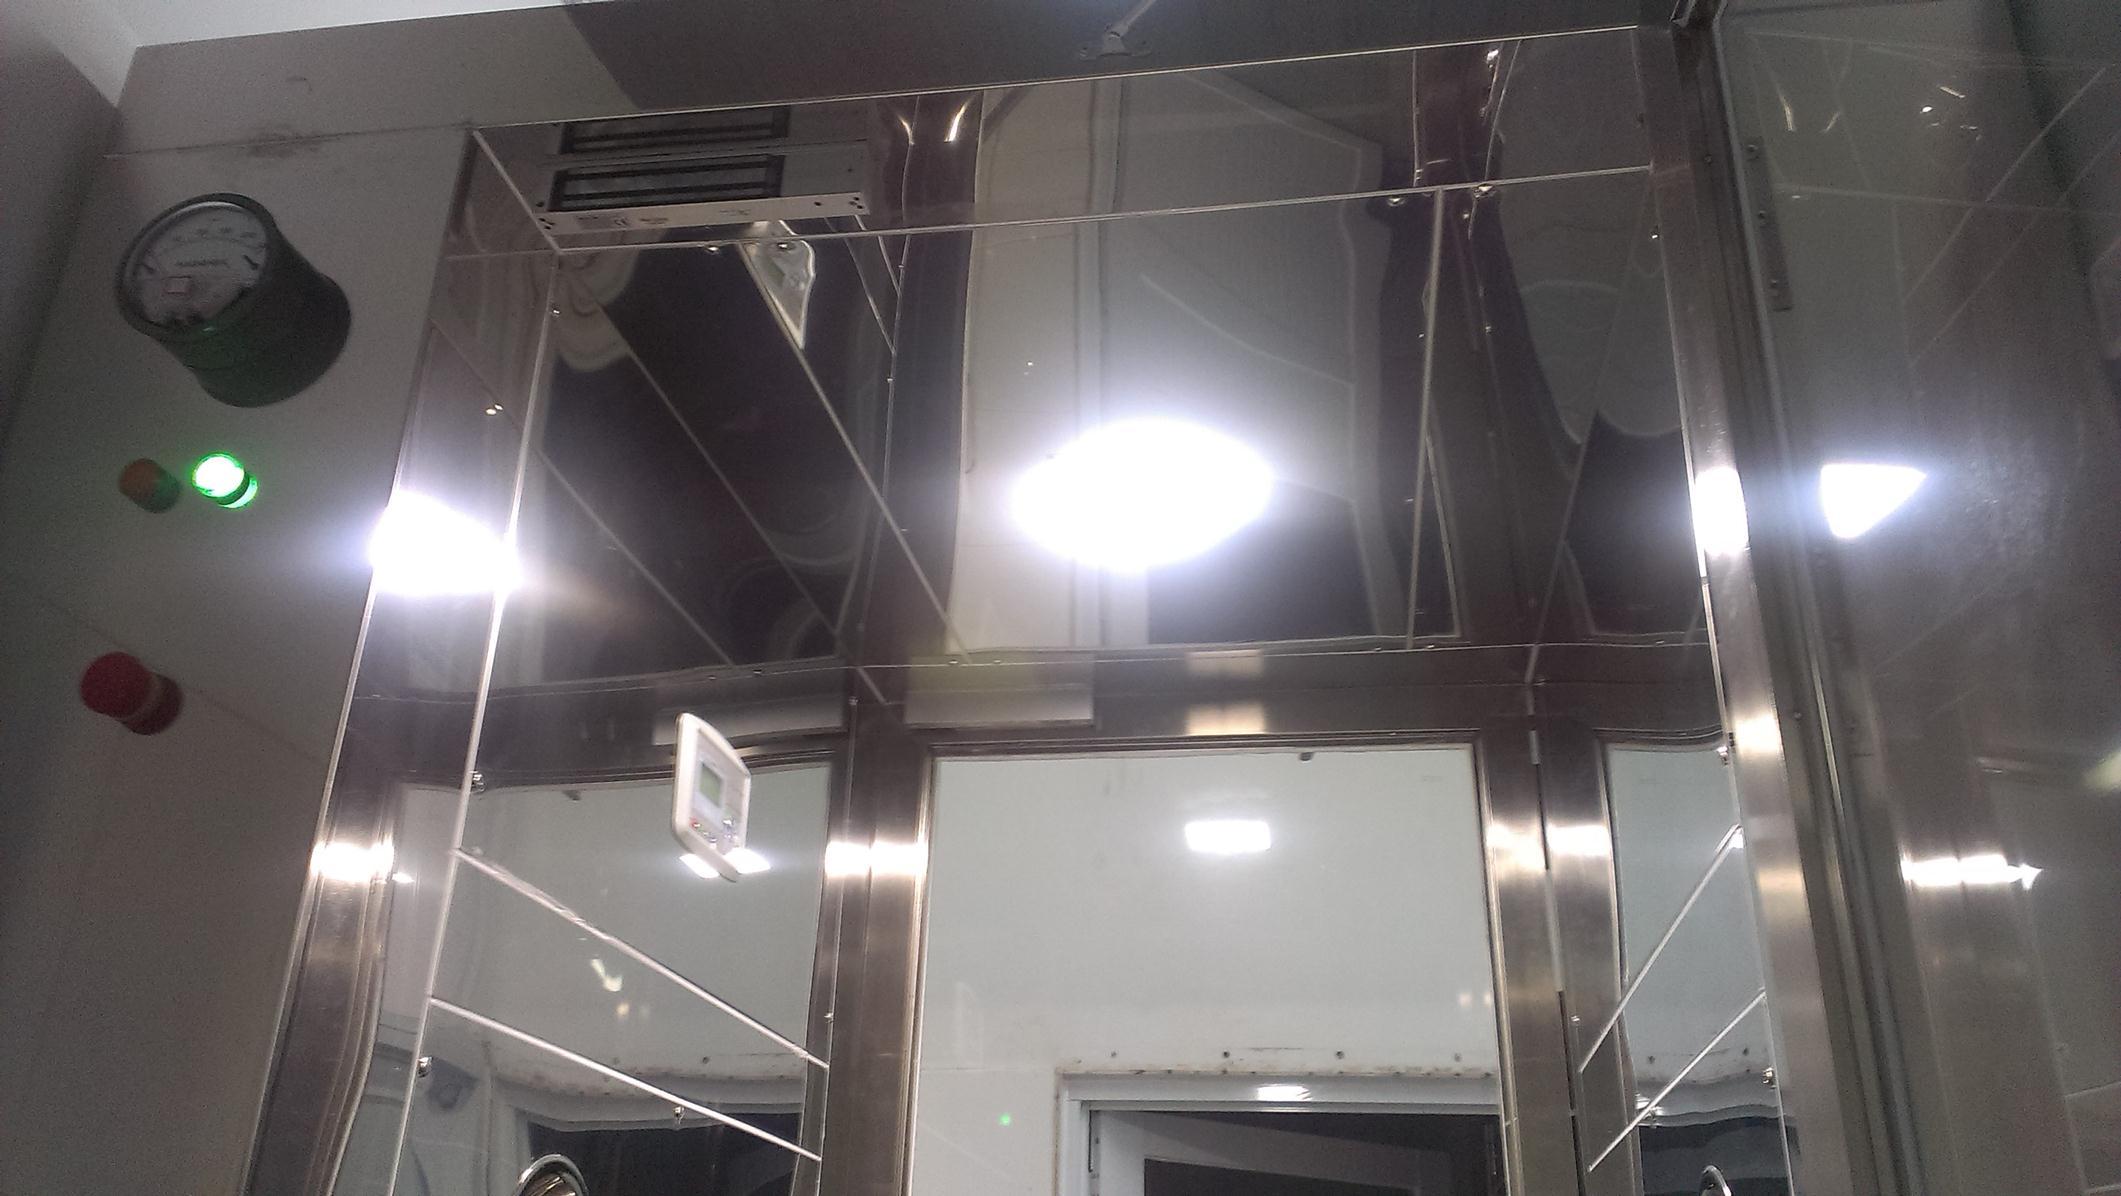 Air Shower - Thiết bị phòng sạch